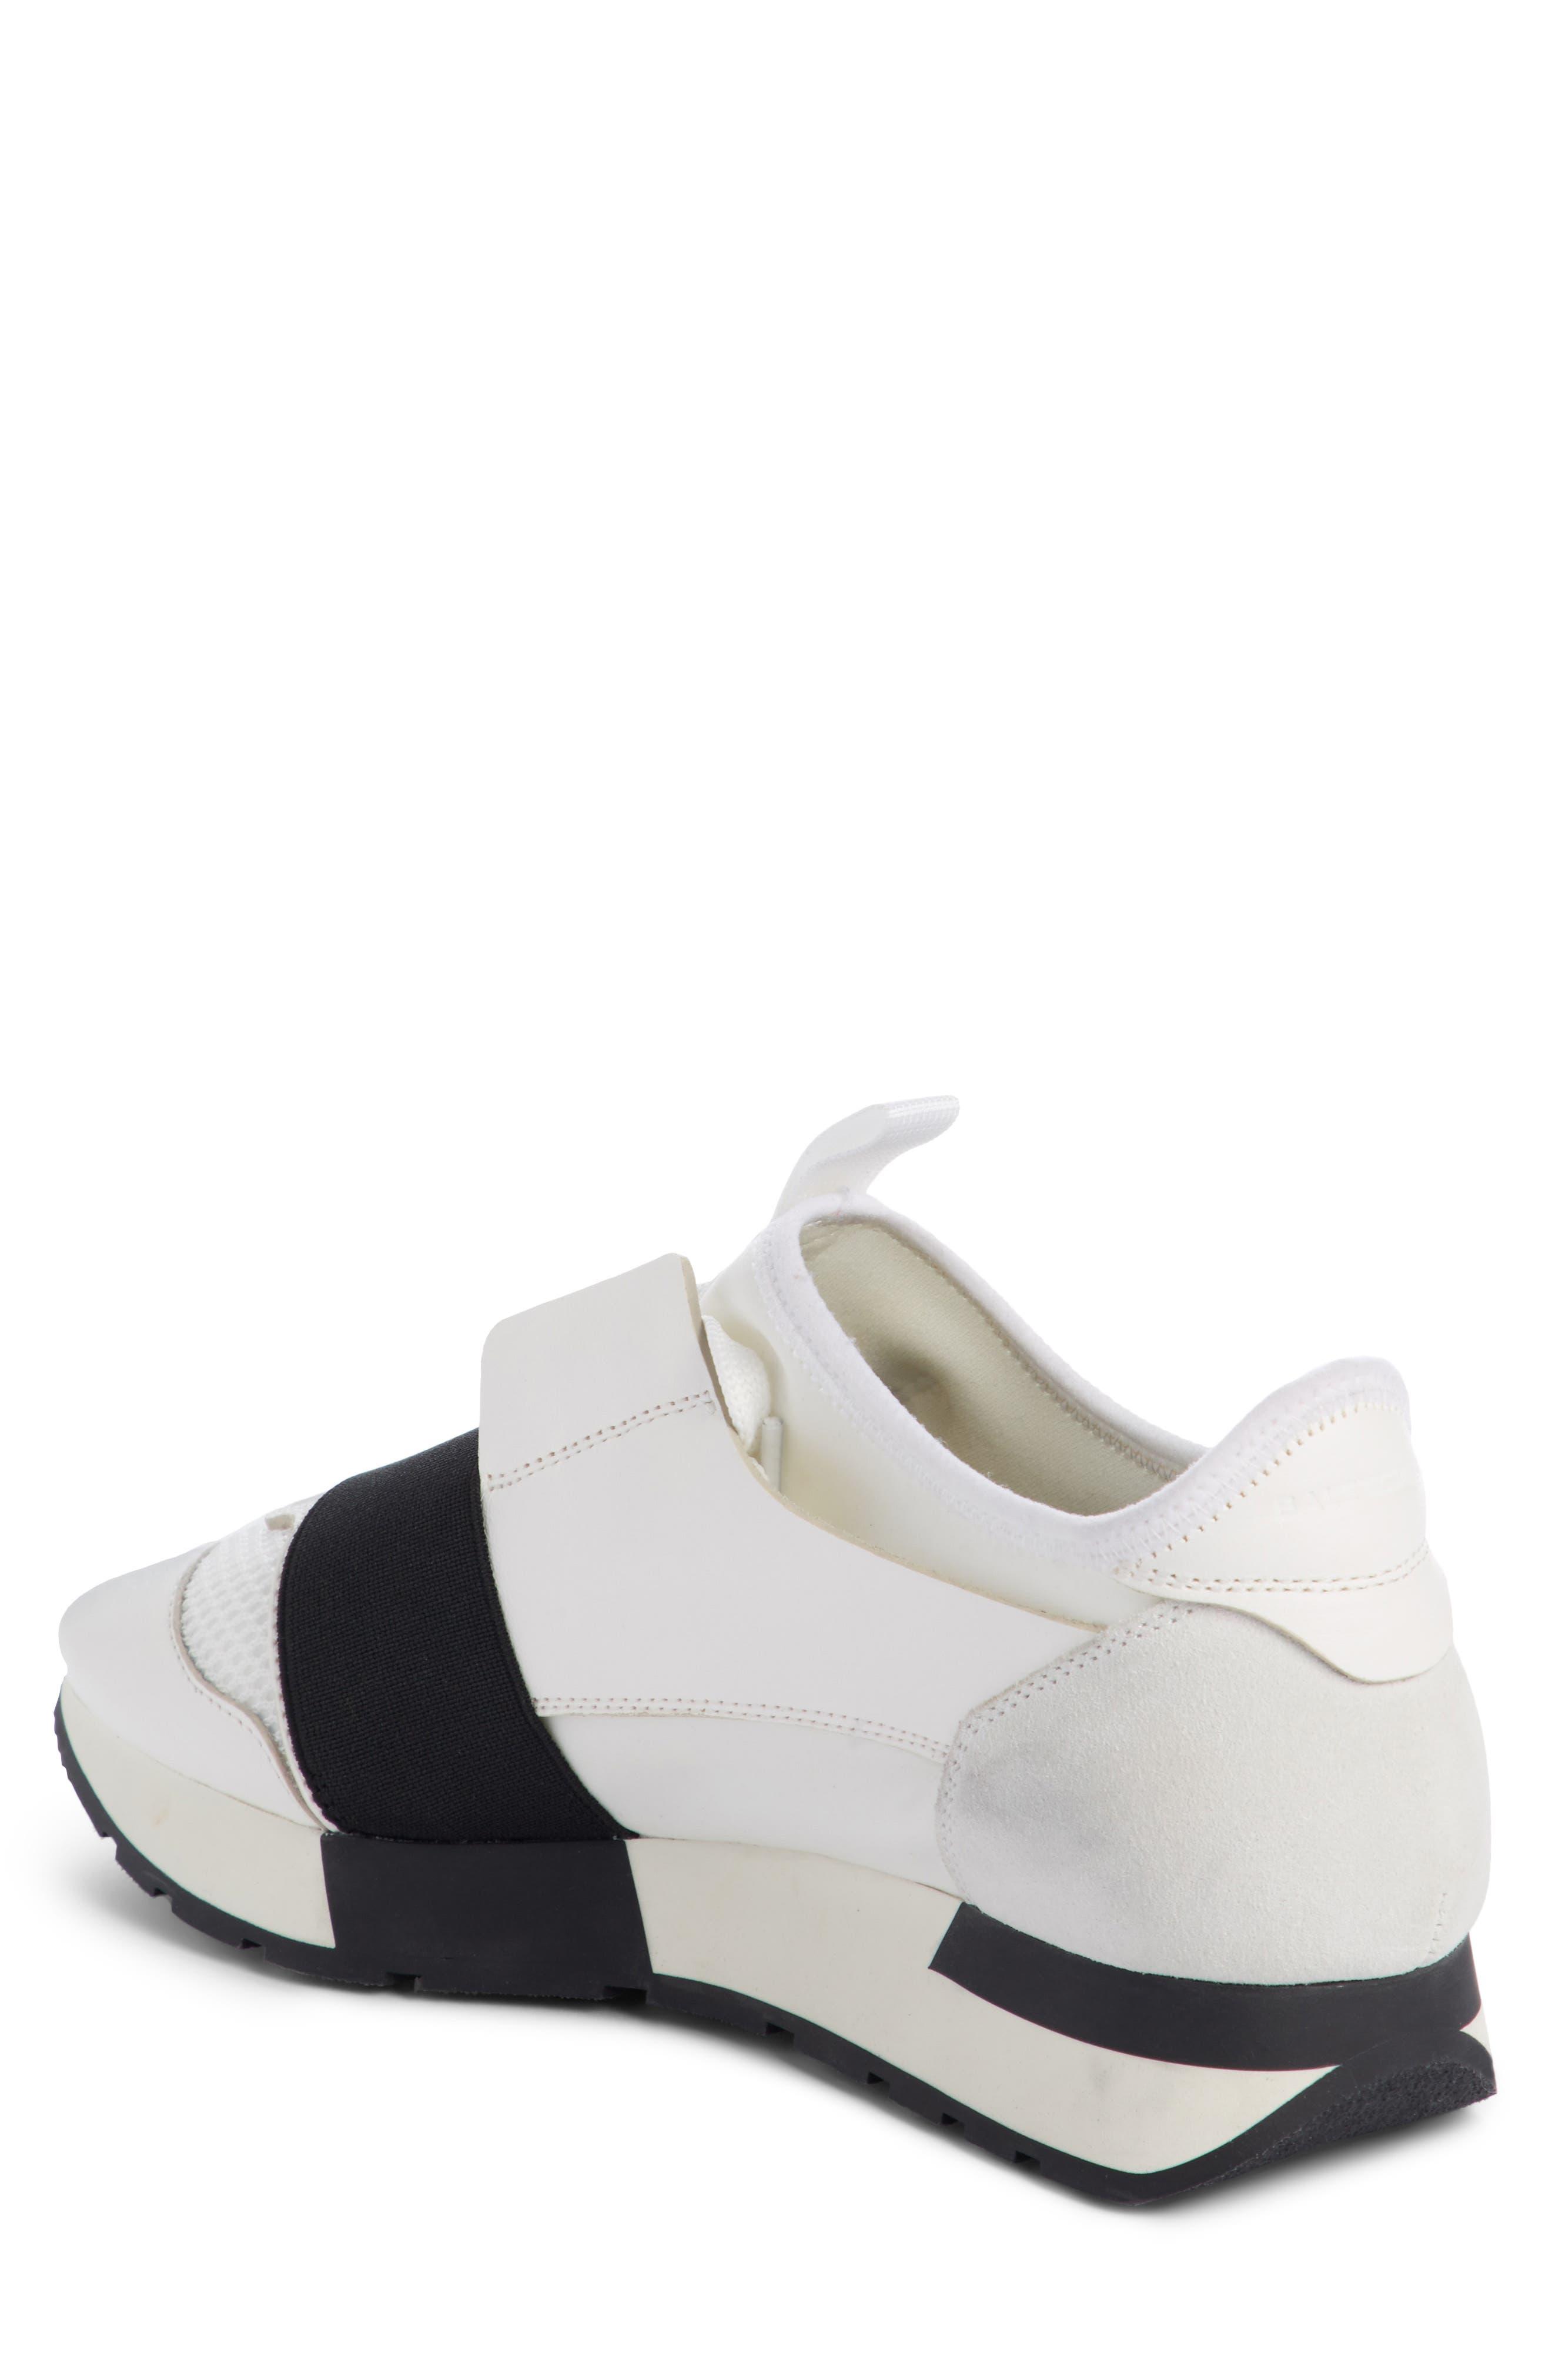 Mixed Media Trainer Sneaker,                             Alternate thumbnail 2, color,                             White/ Black